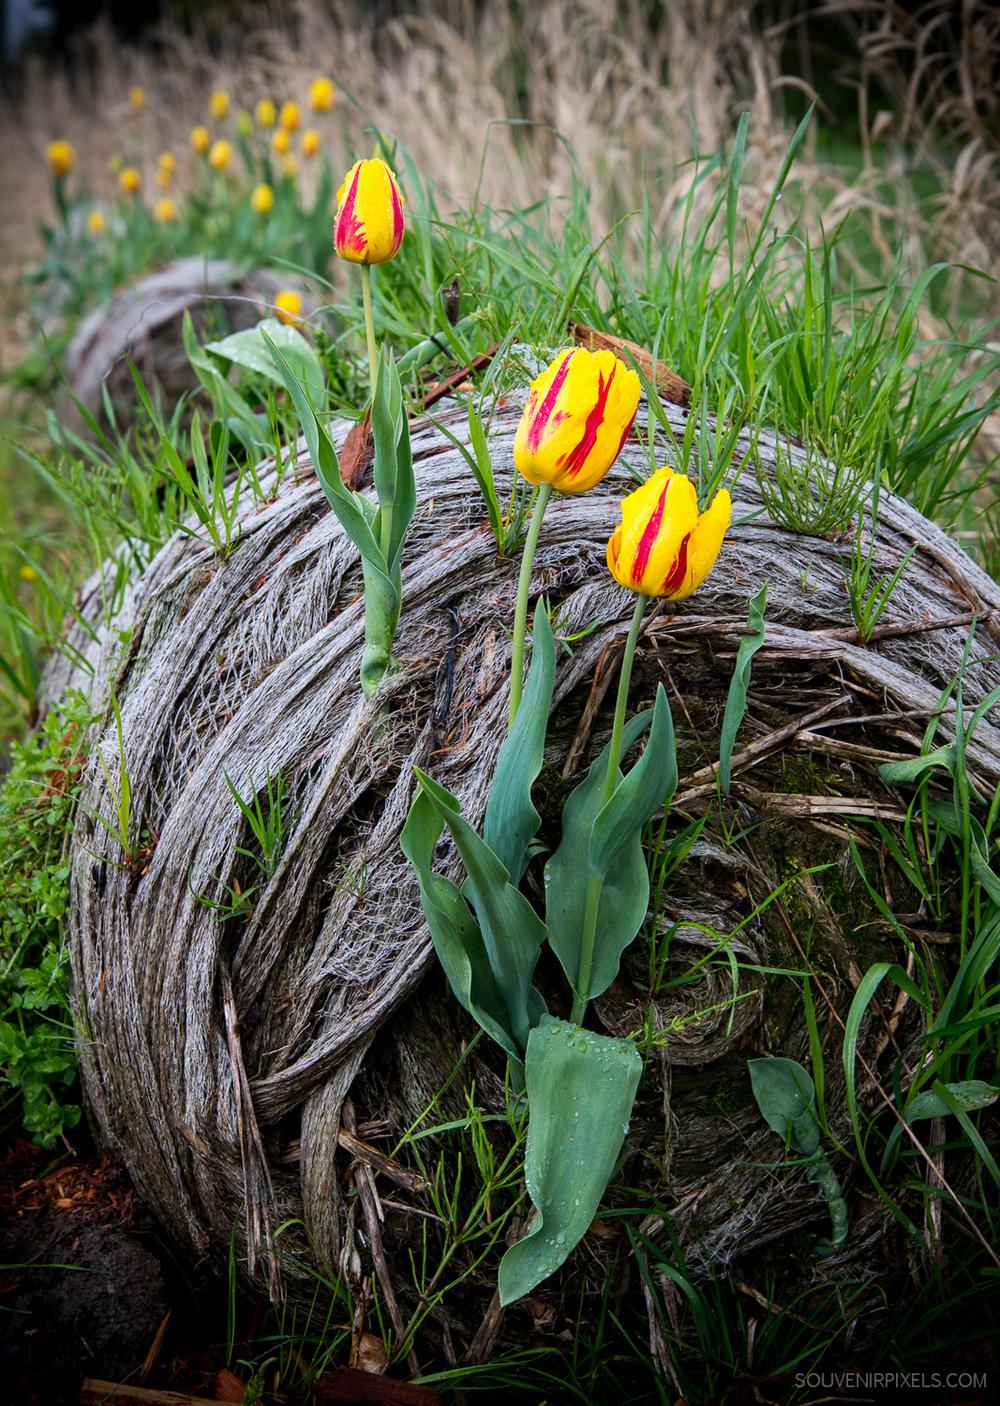 P0441-Tulip Bail-XLarge.jpg